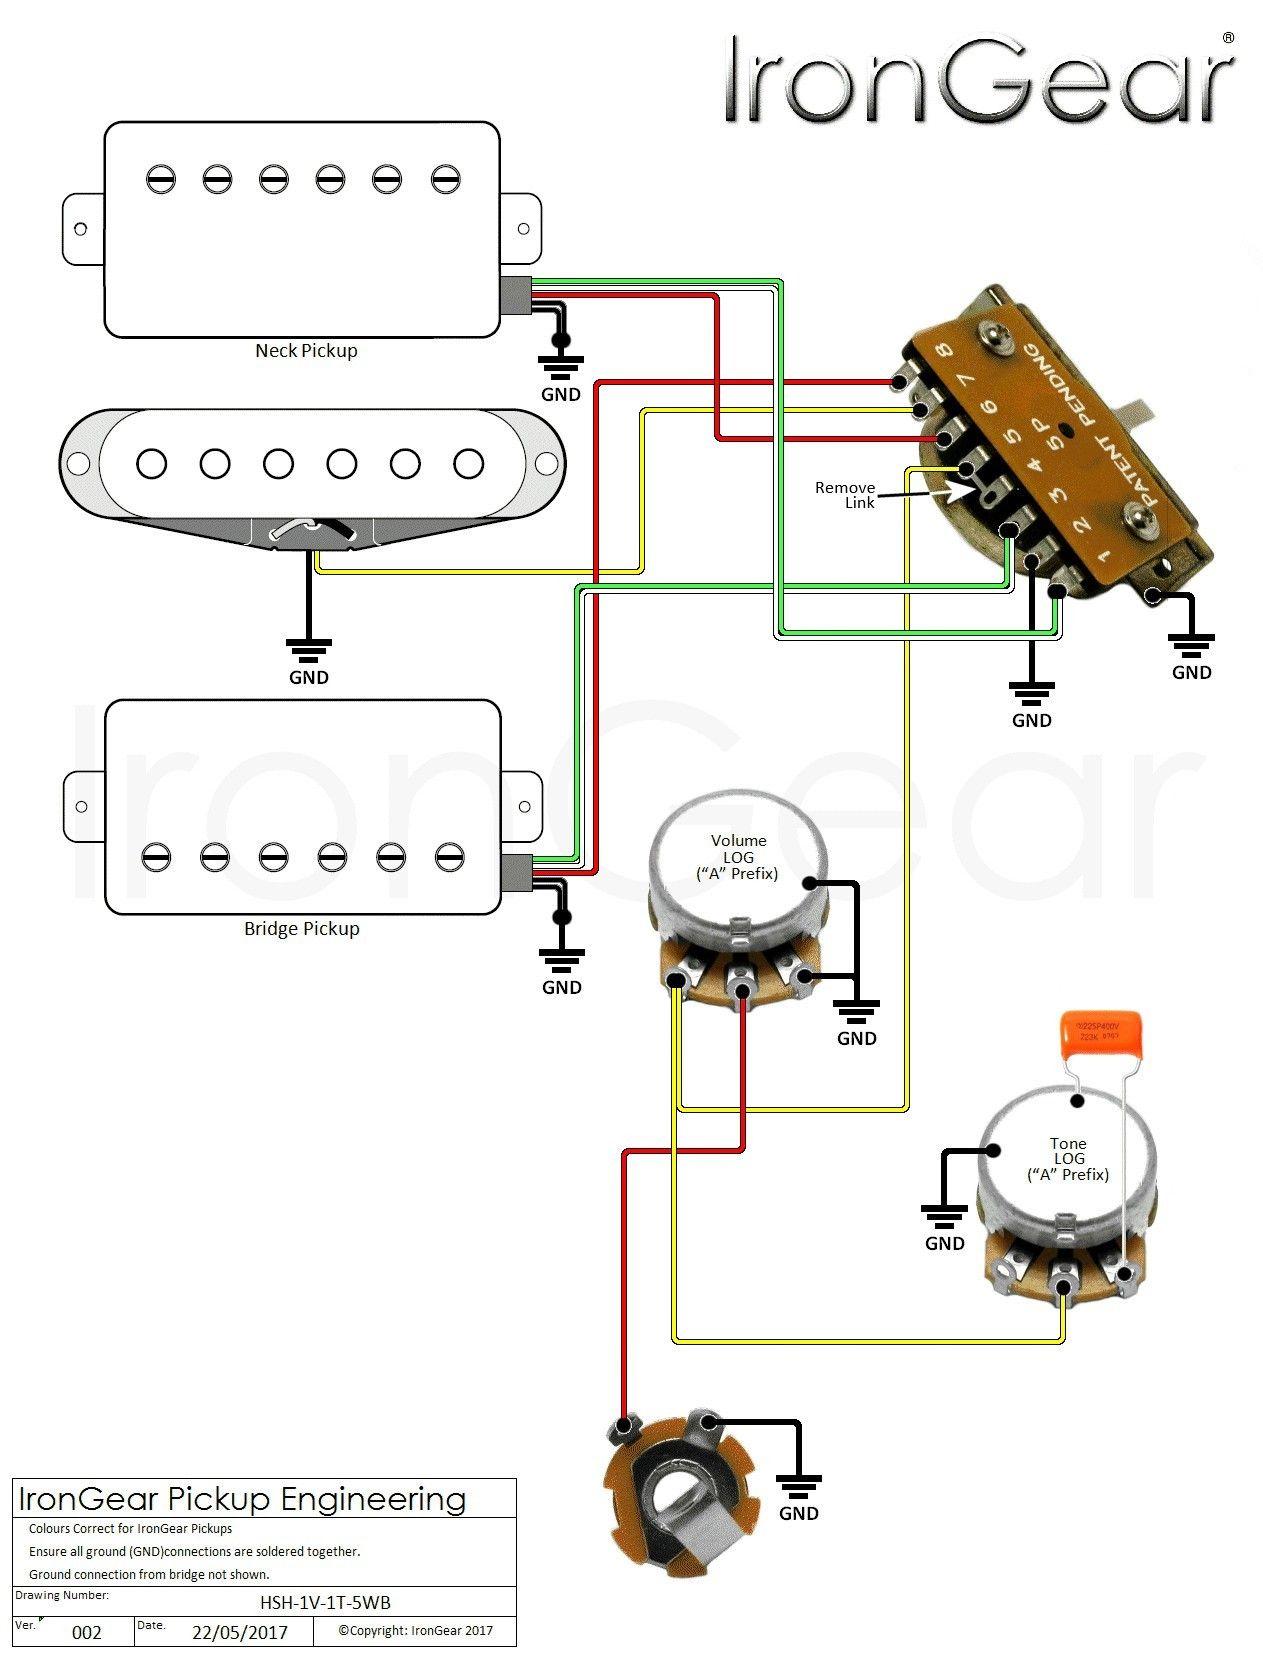 3 way guitar switch wiring diagram blade fresh wiring diagram guitar diagrams digramssample  fresh wiring diagram guitar diagrams